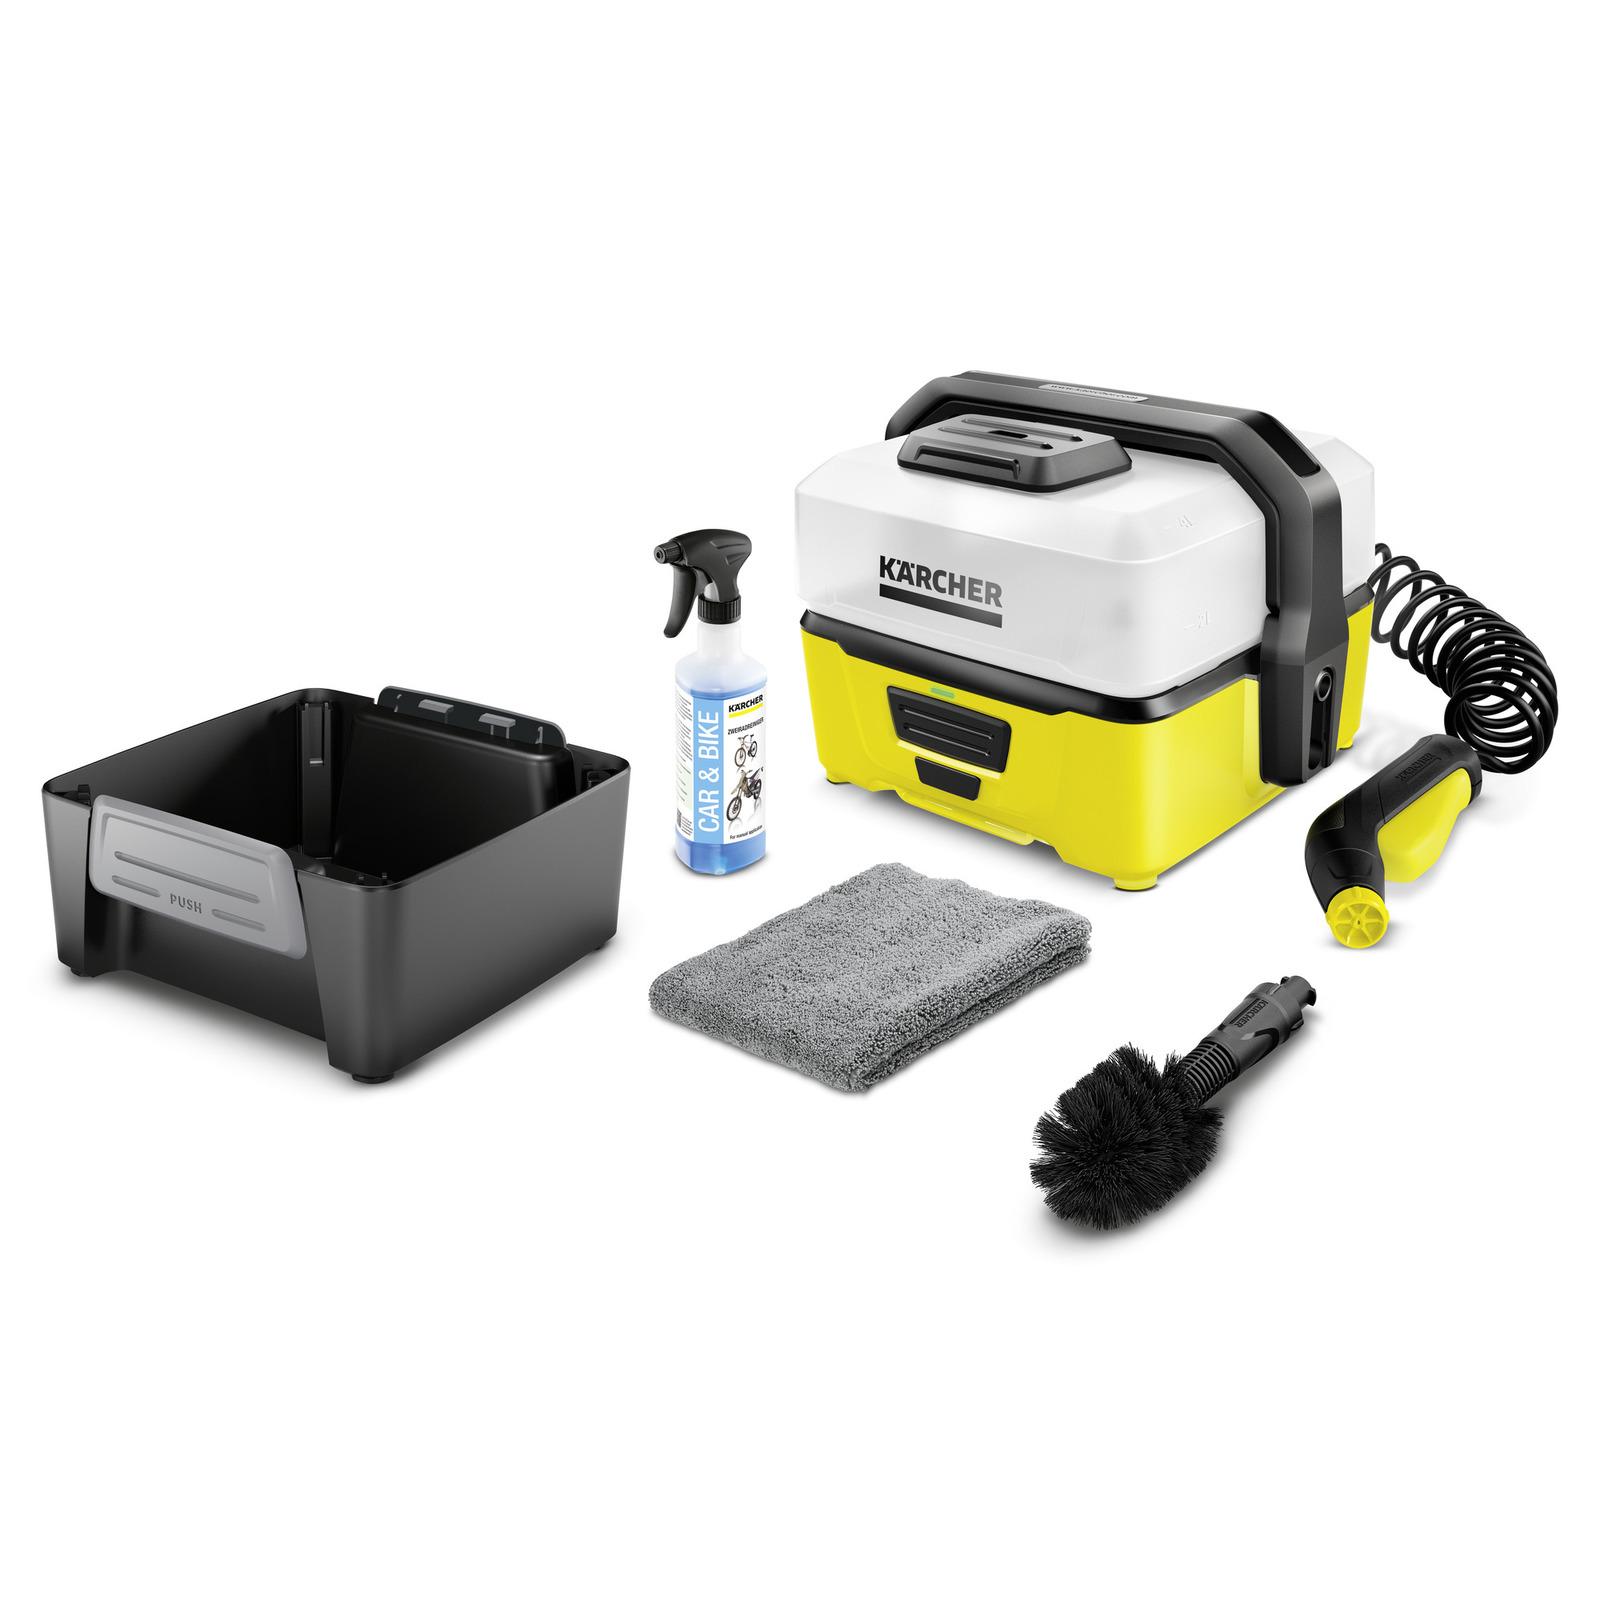 mobile outdoor cleaner nettoyeur mobile ext rieur box v lo k rcher. Black Bedroom Furniture Sets. Home Design Ideas